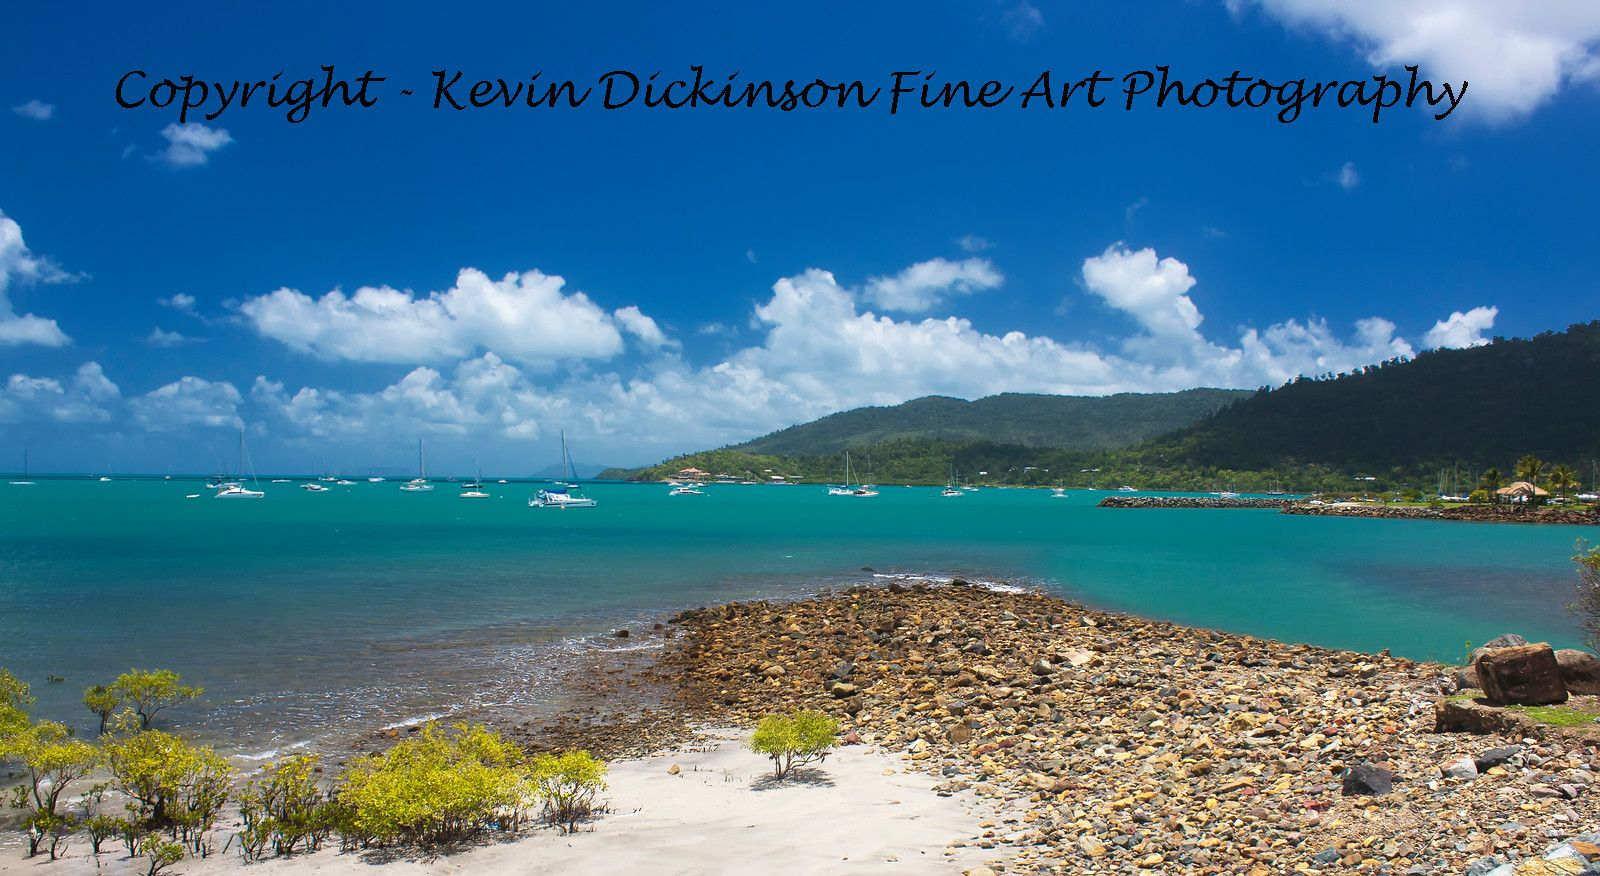 Airlie Beach, Qld, Australia. Great Barrier Reef, Australia Buy seascape photograph, Visit Australia, Kevin Dickinson fine art photography, canon photography,